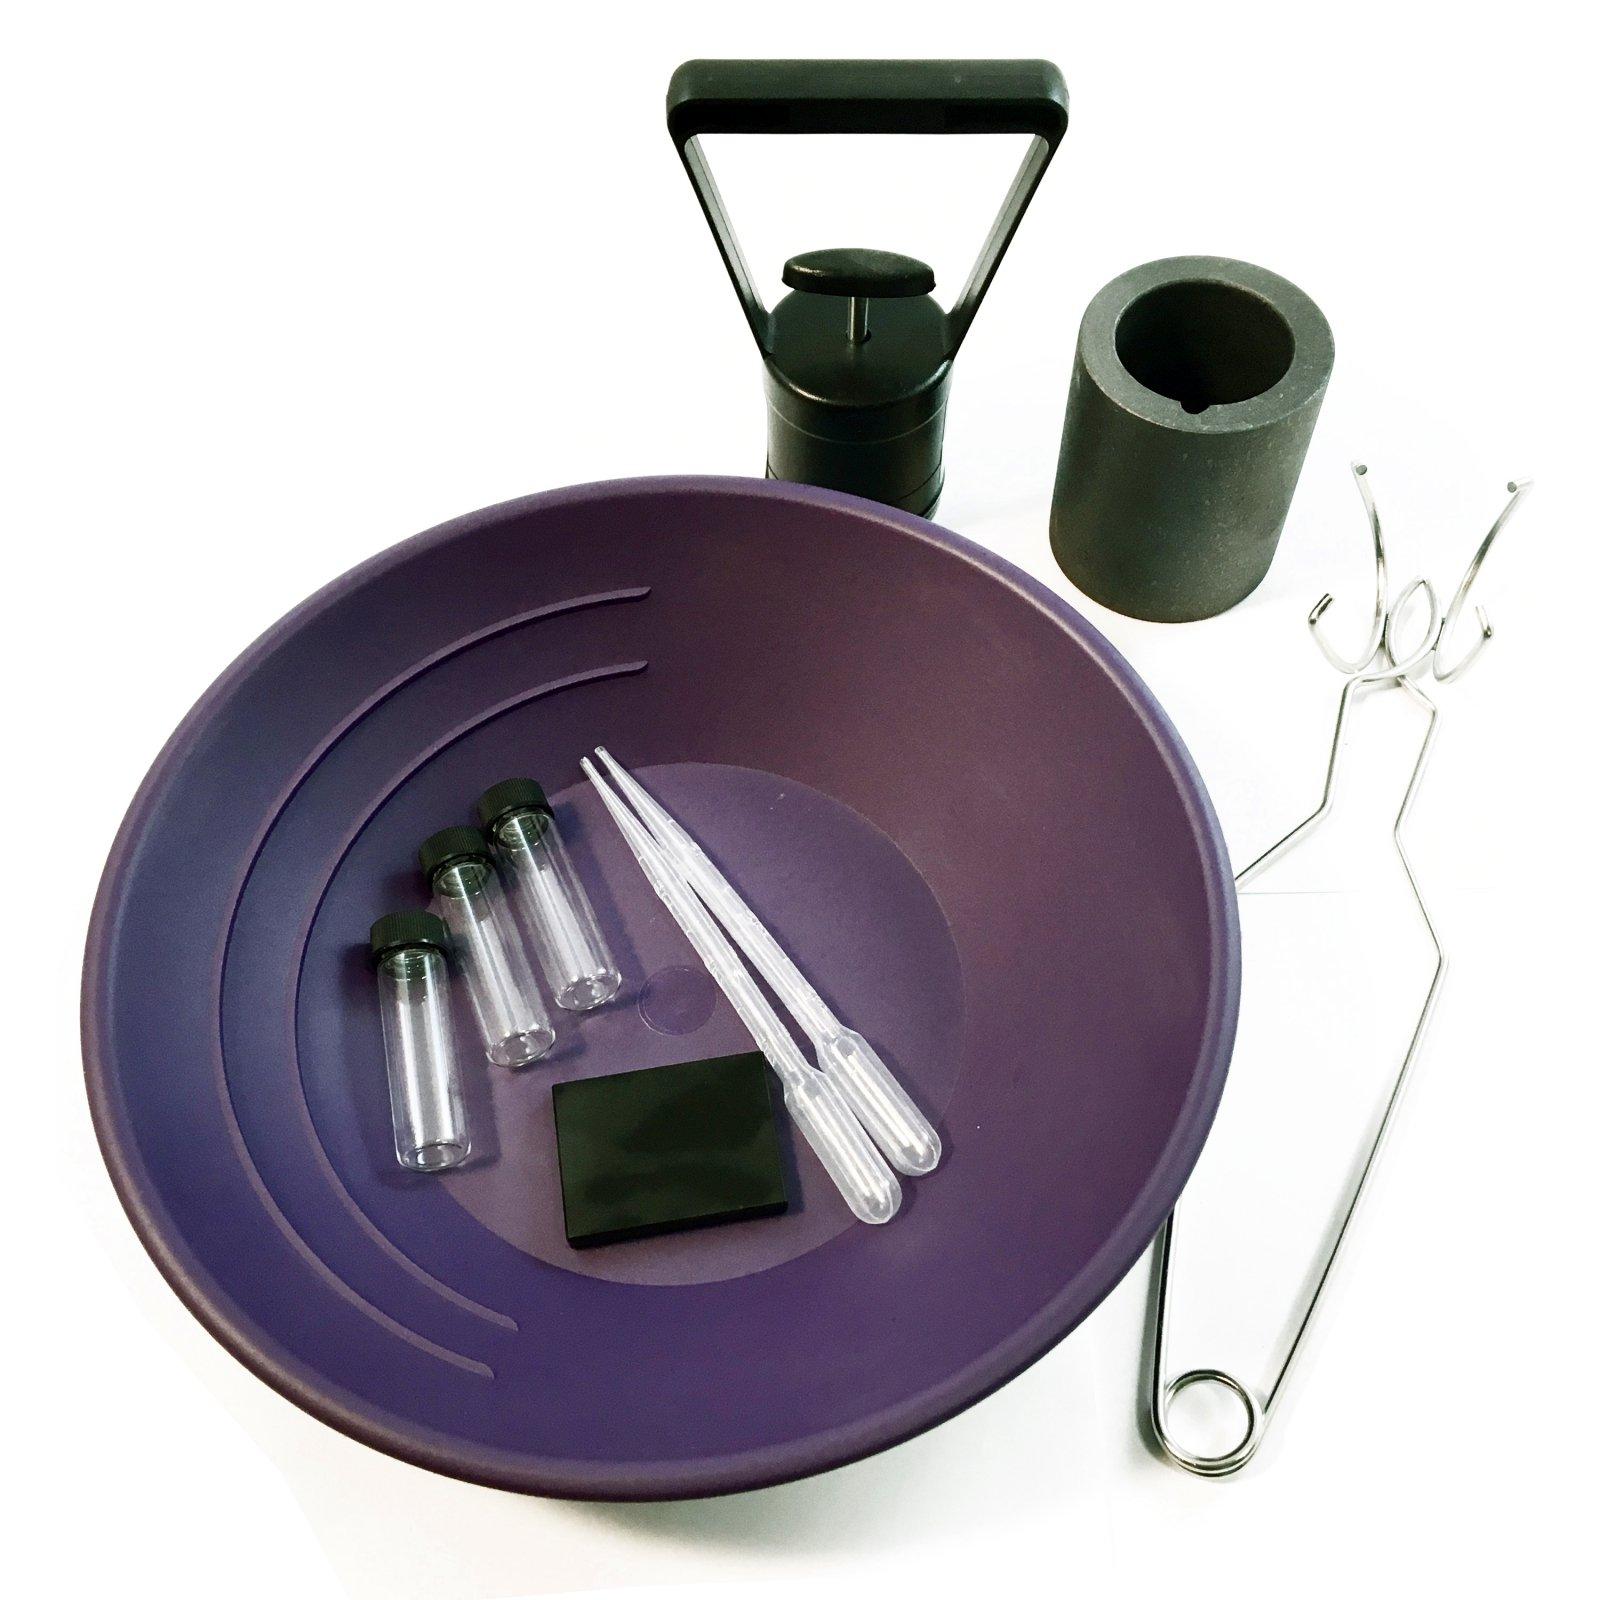 ASR Outdoor Gold Rush Gold Prospecting Pan Kit Glass Vials Testing Stone - 10pc